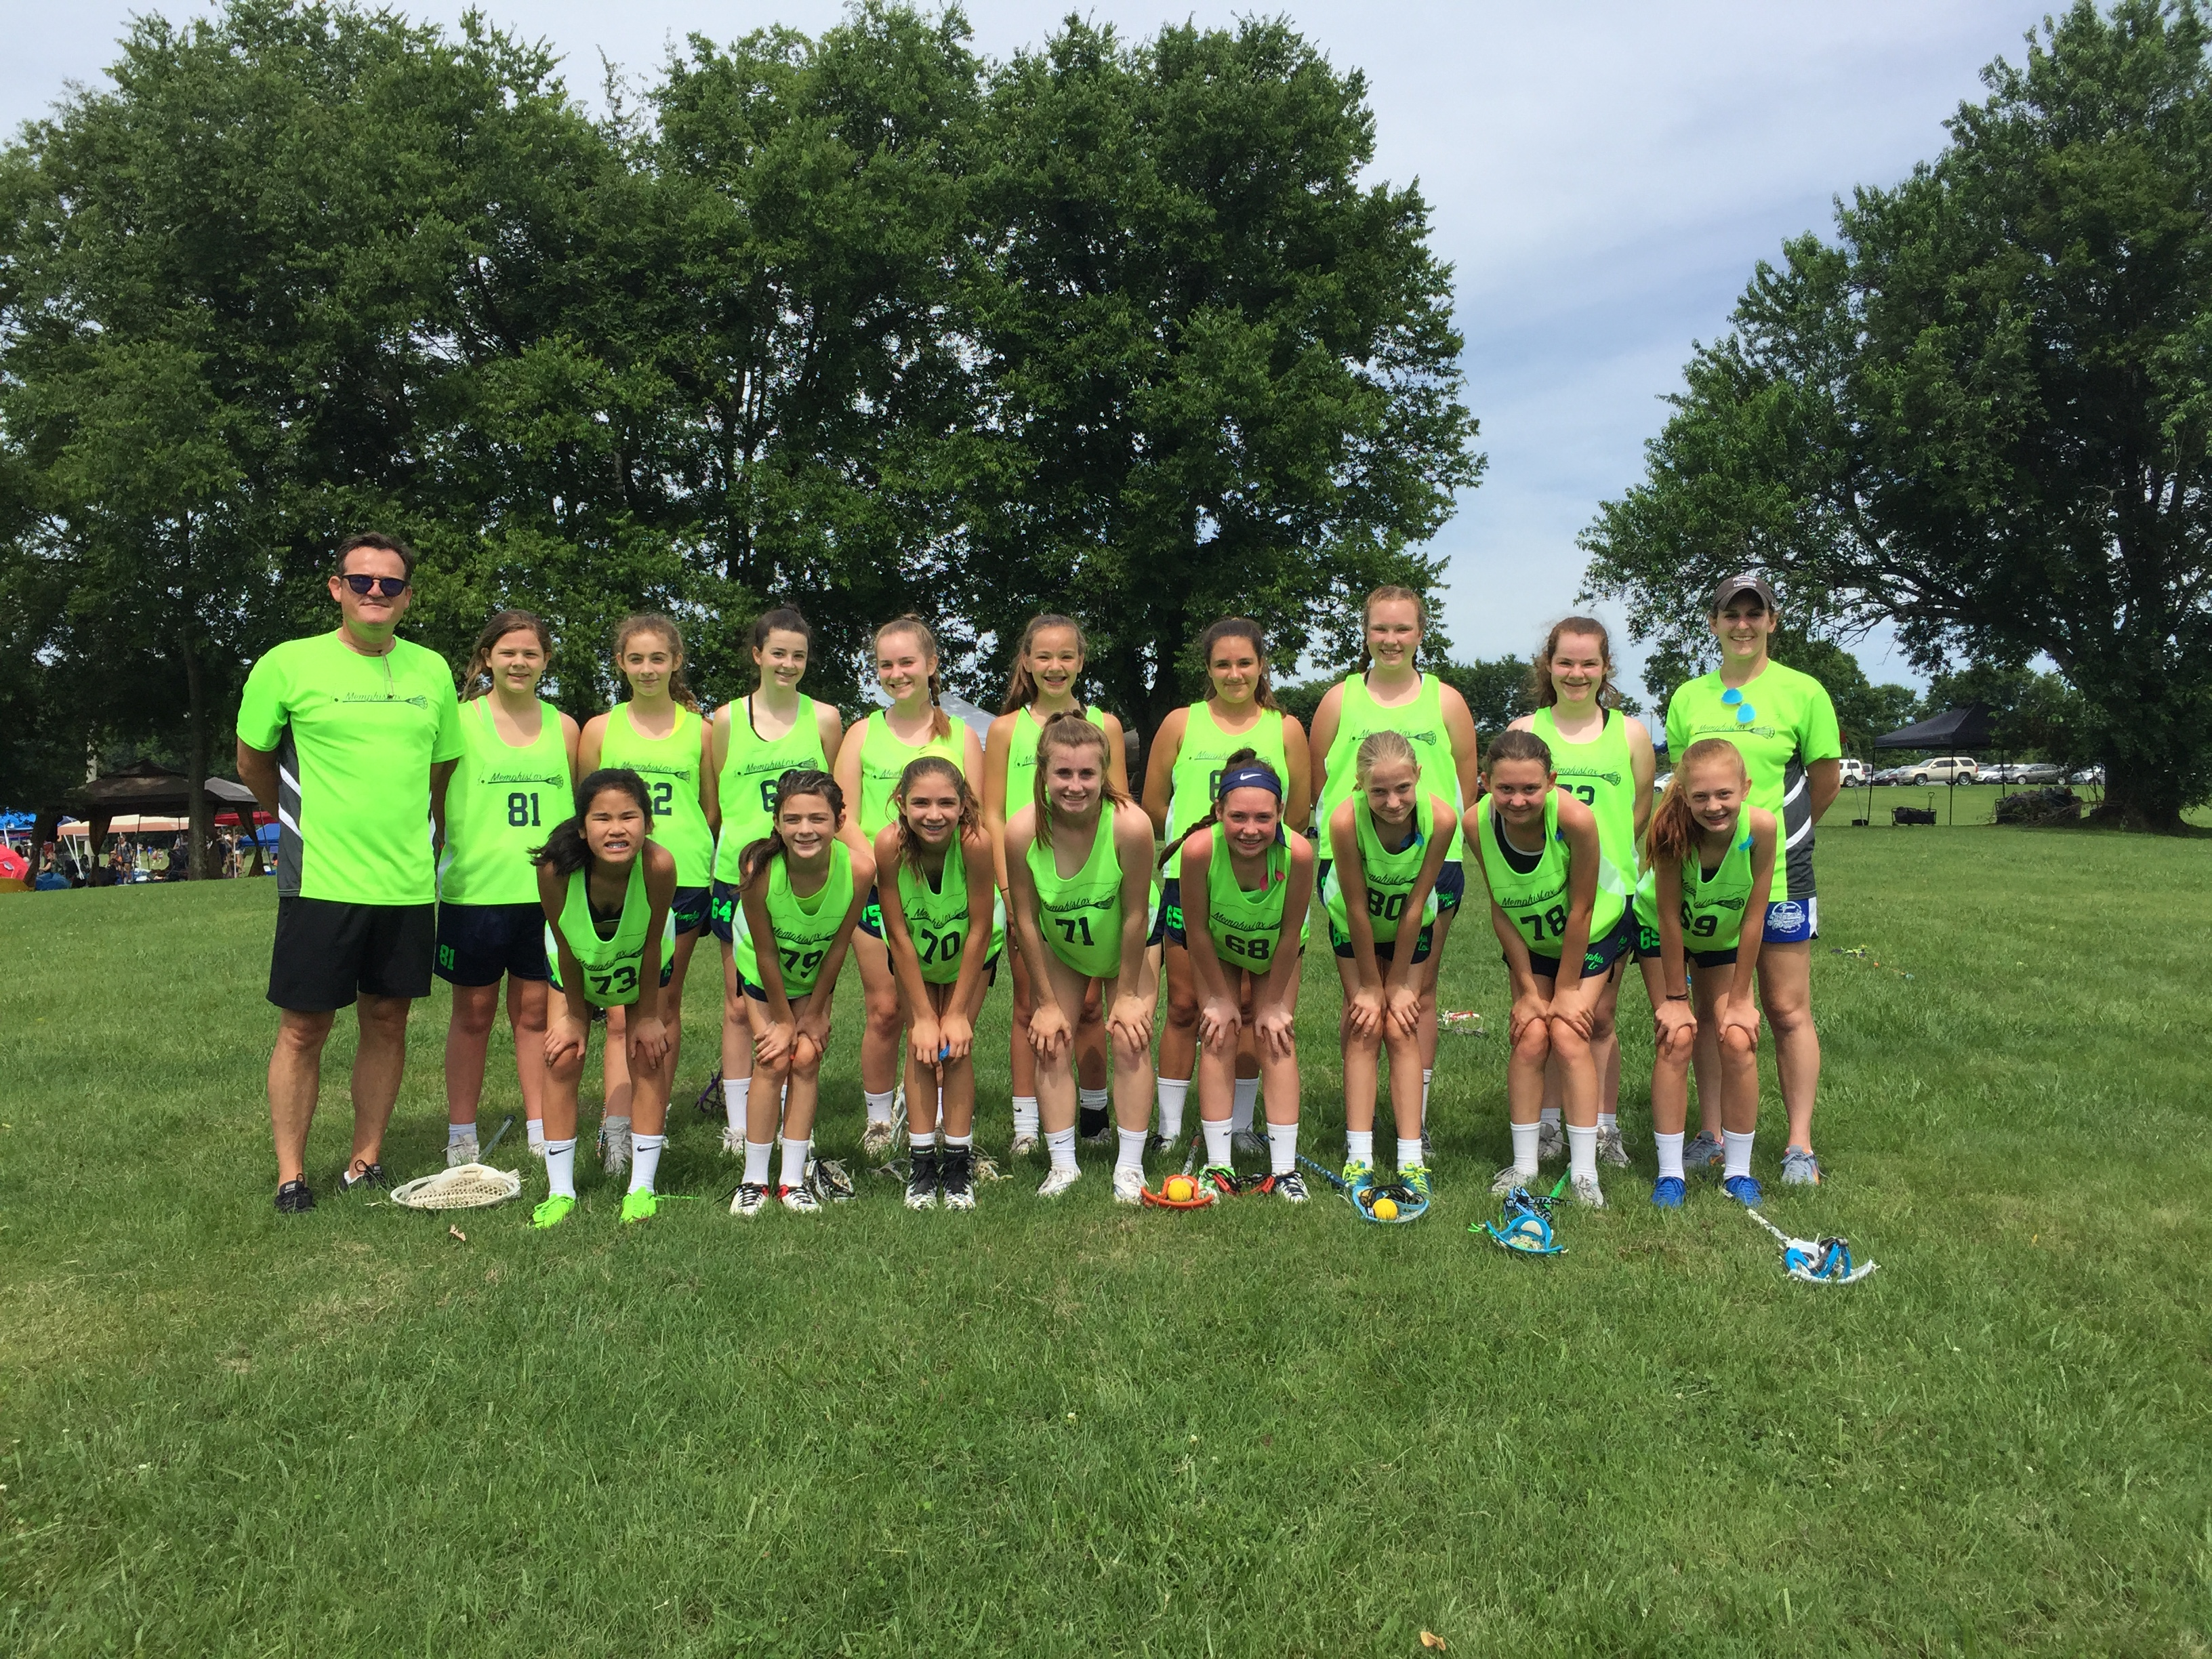 2017 Middle School Team